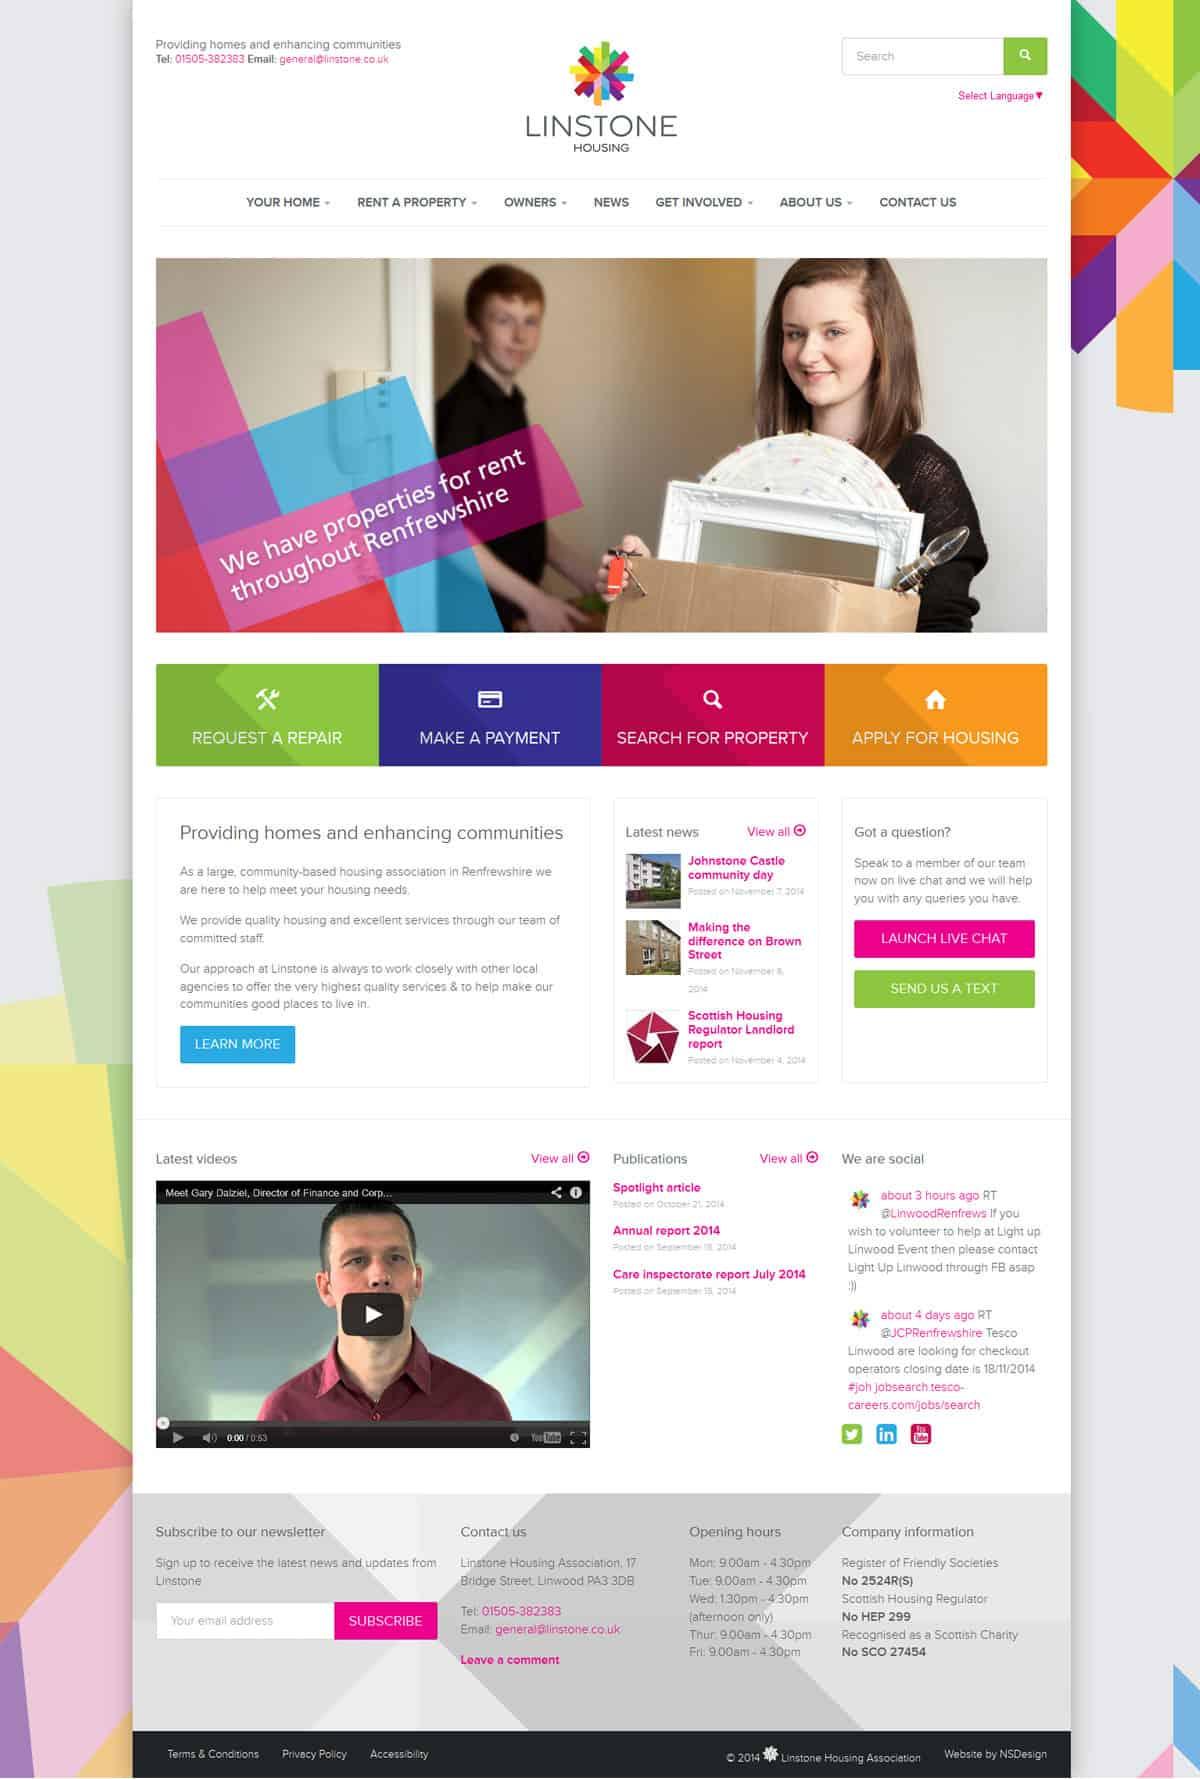 Linstone Housing Association - Design and Development | Wordpress | Illustration | Animation